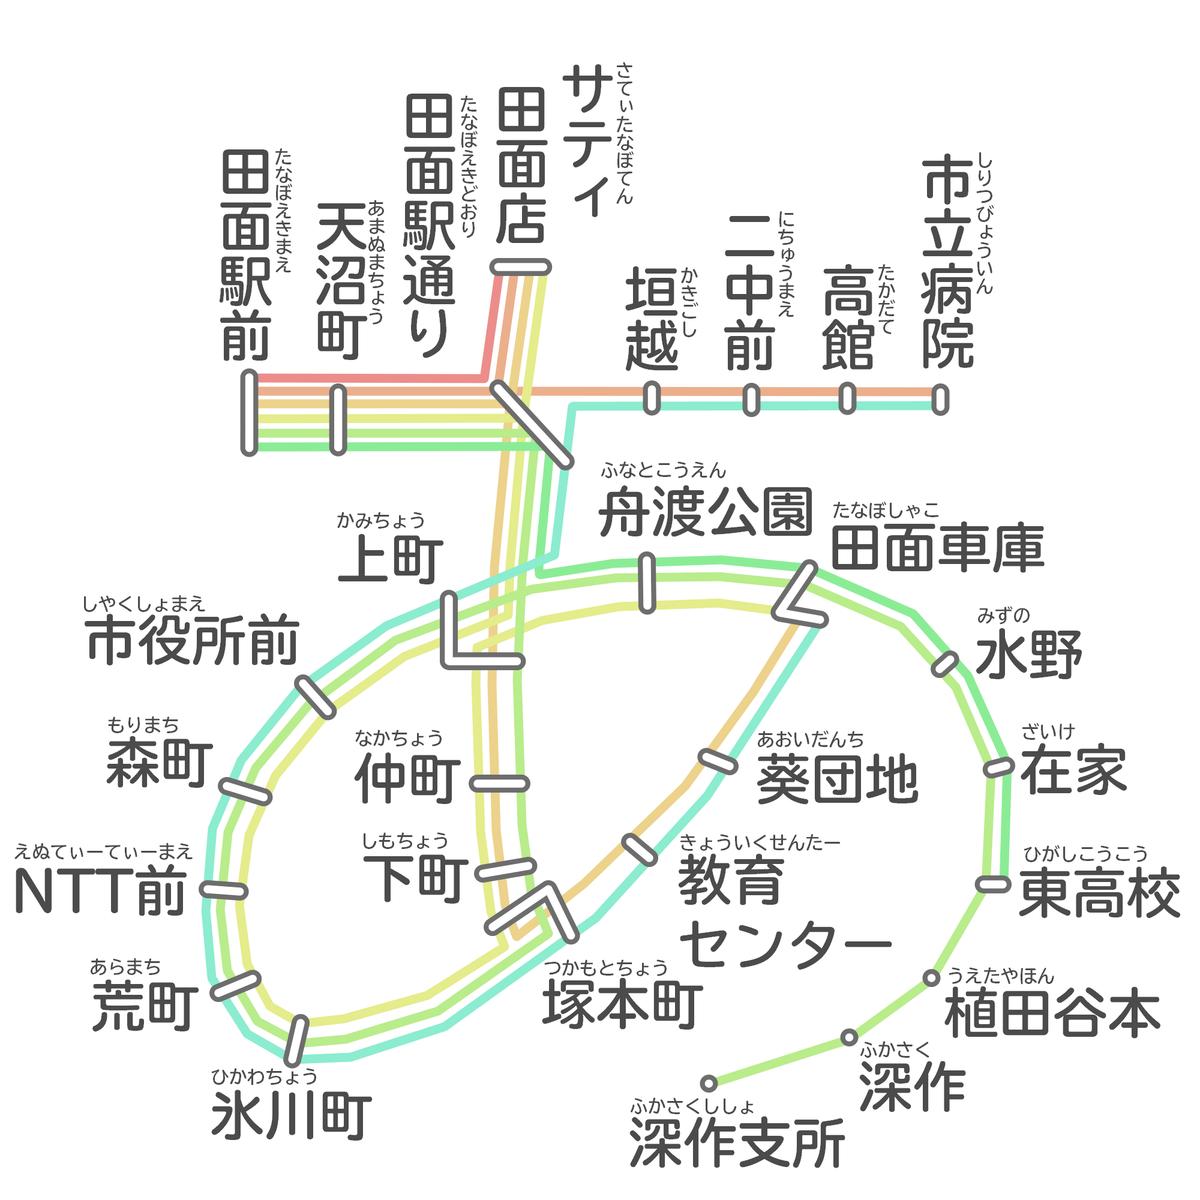 f:id:HOSHIIMO:20210723032349p:plain